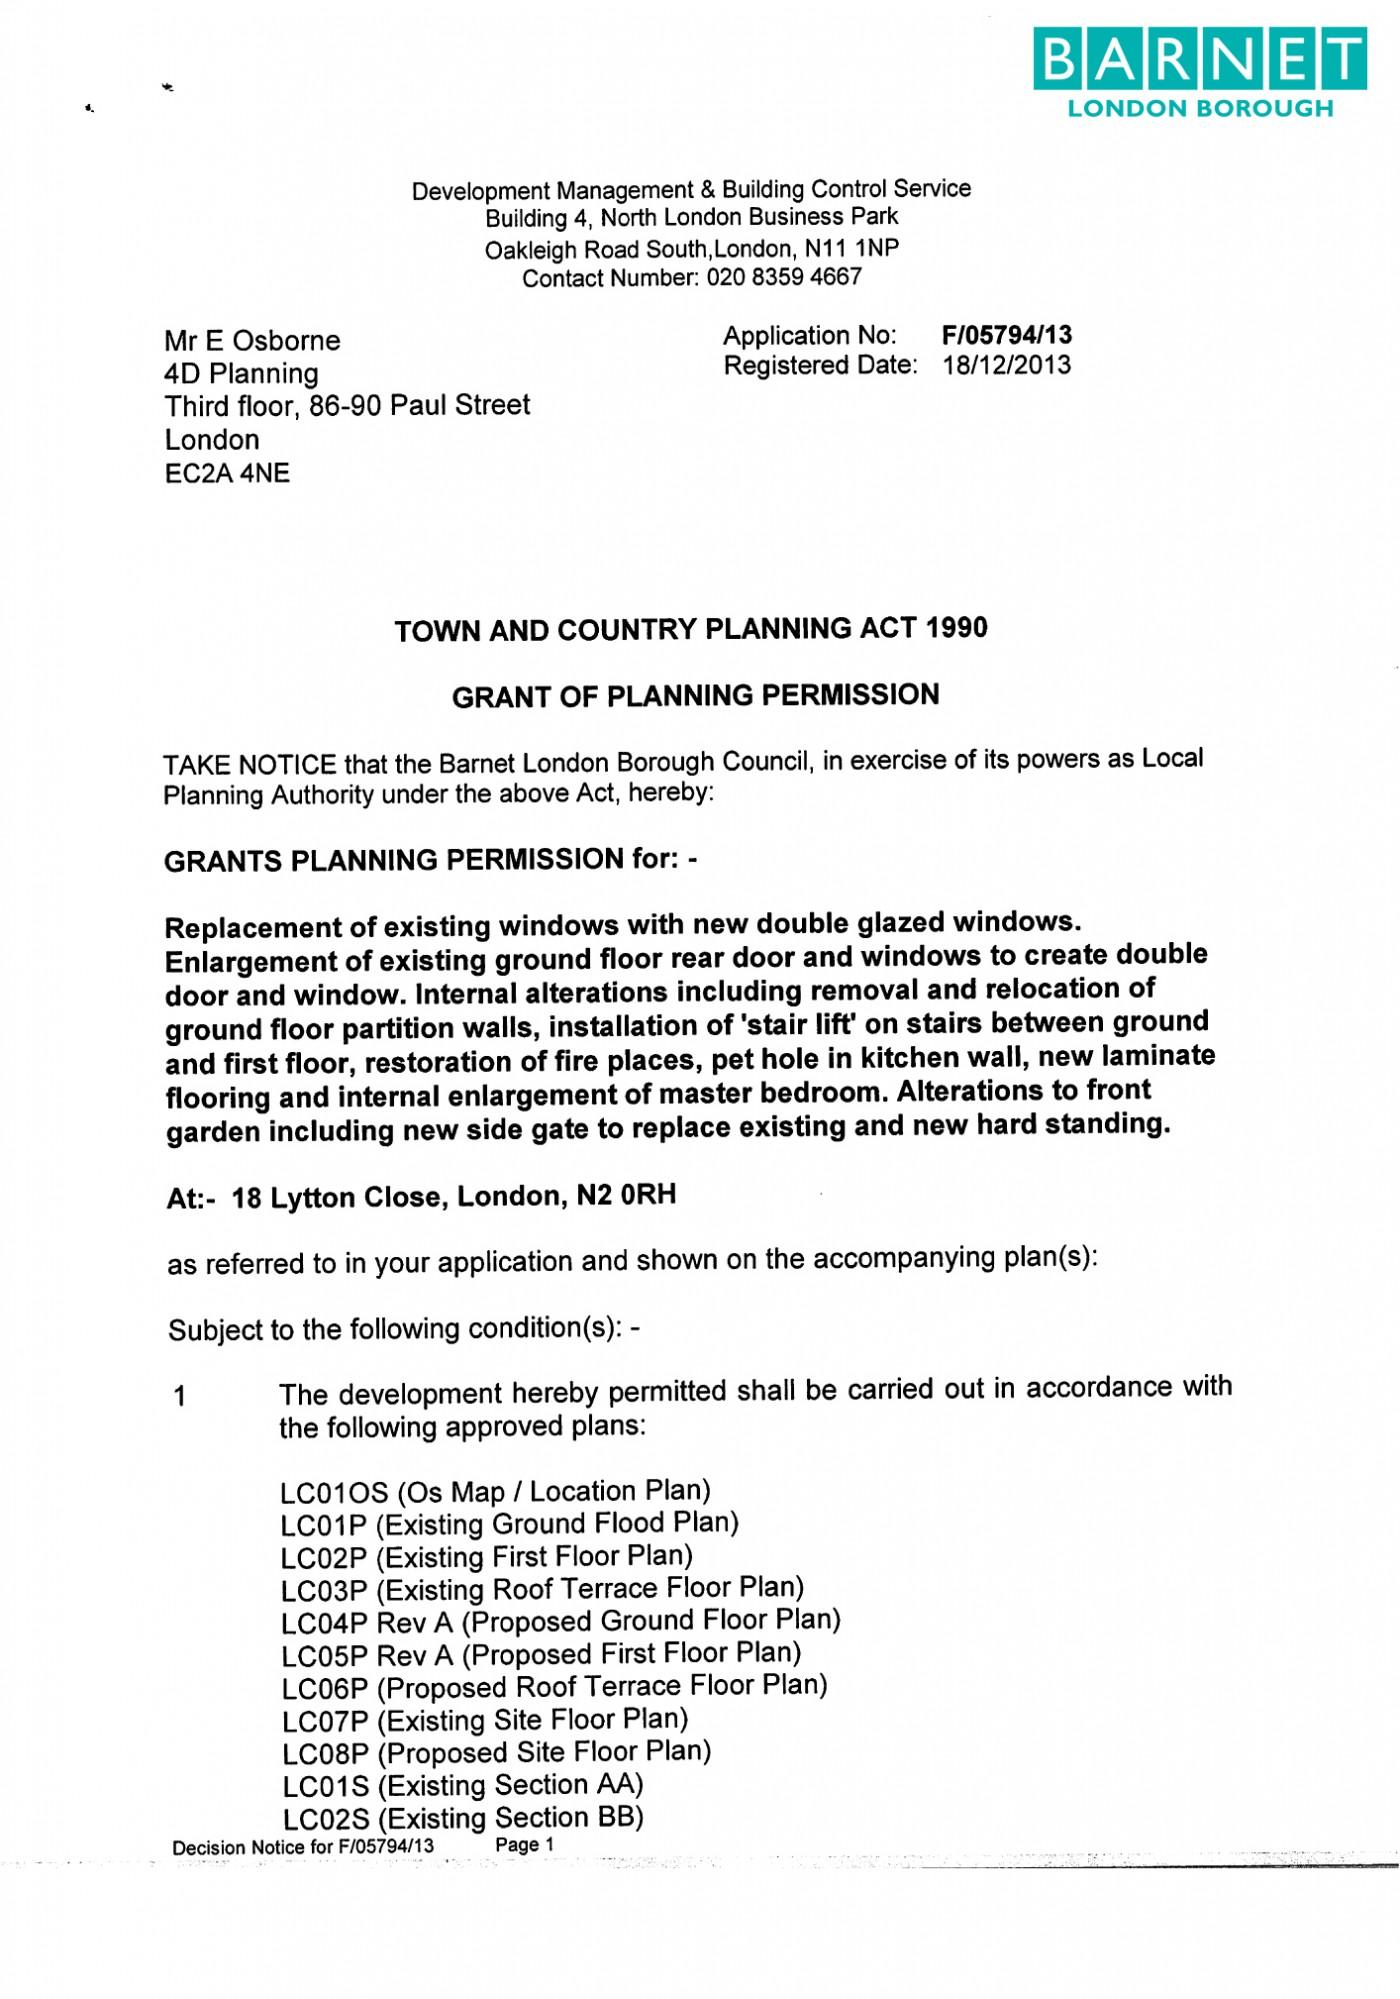 Barnet Council Decision Notice - Granted Planning Permission